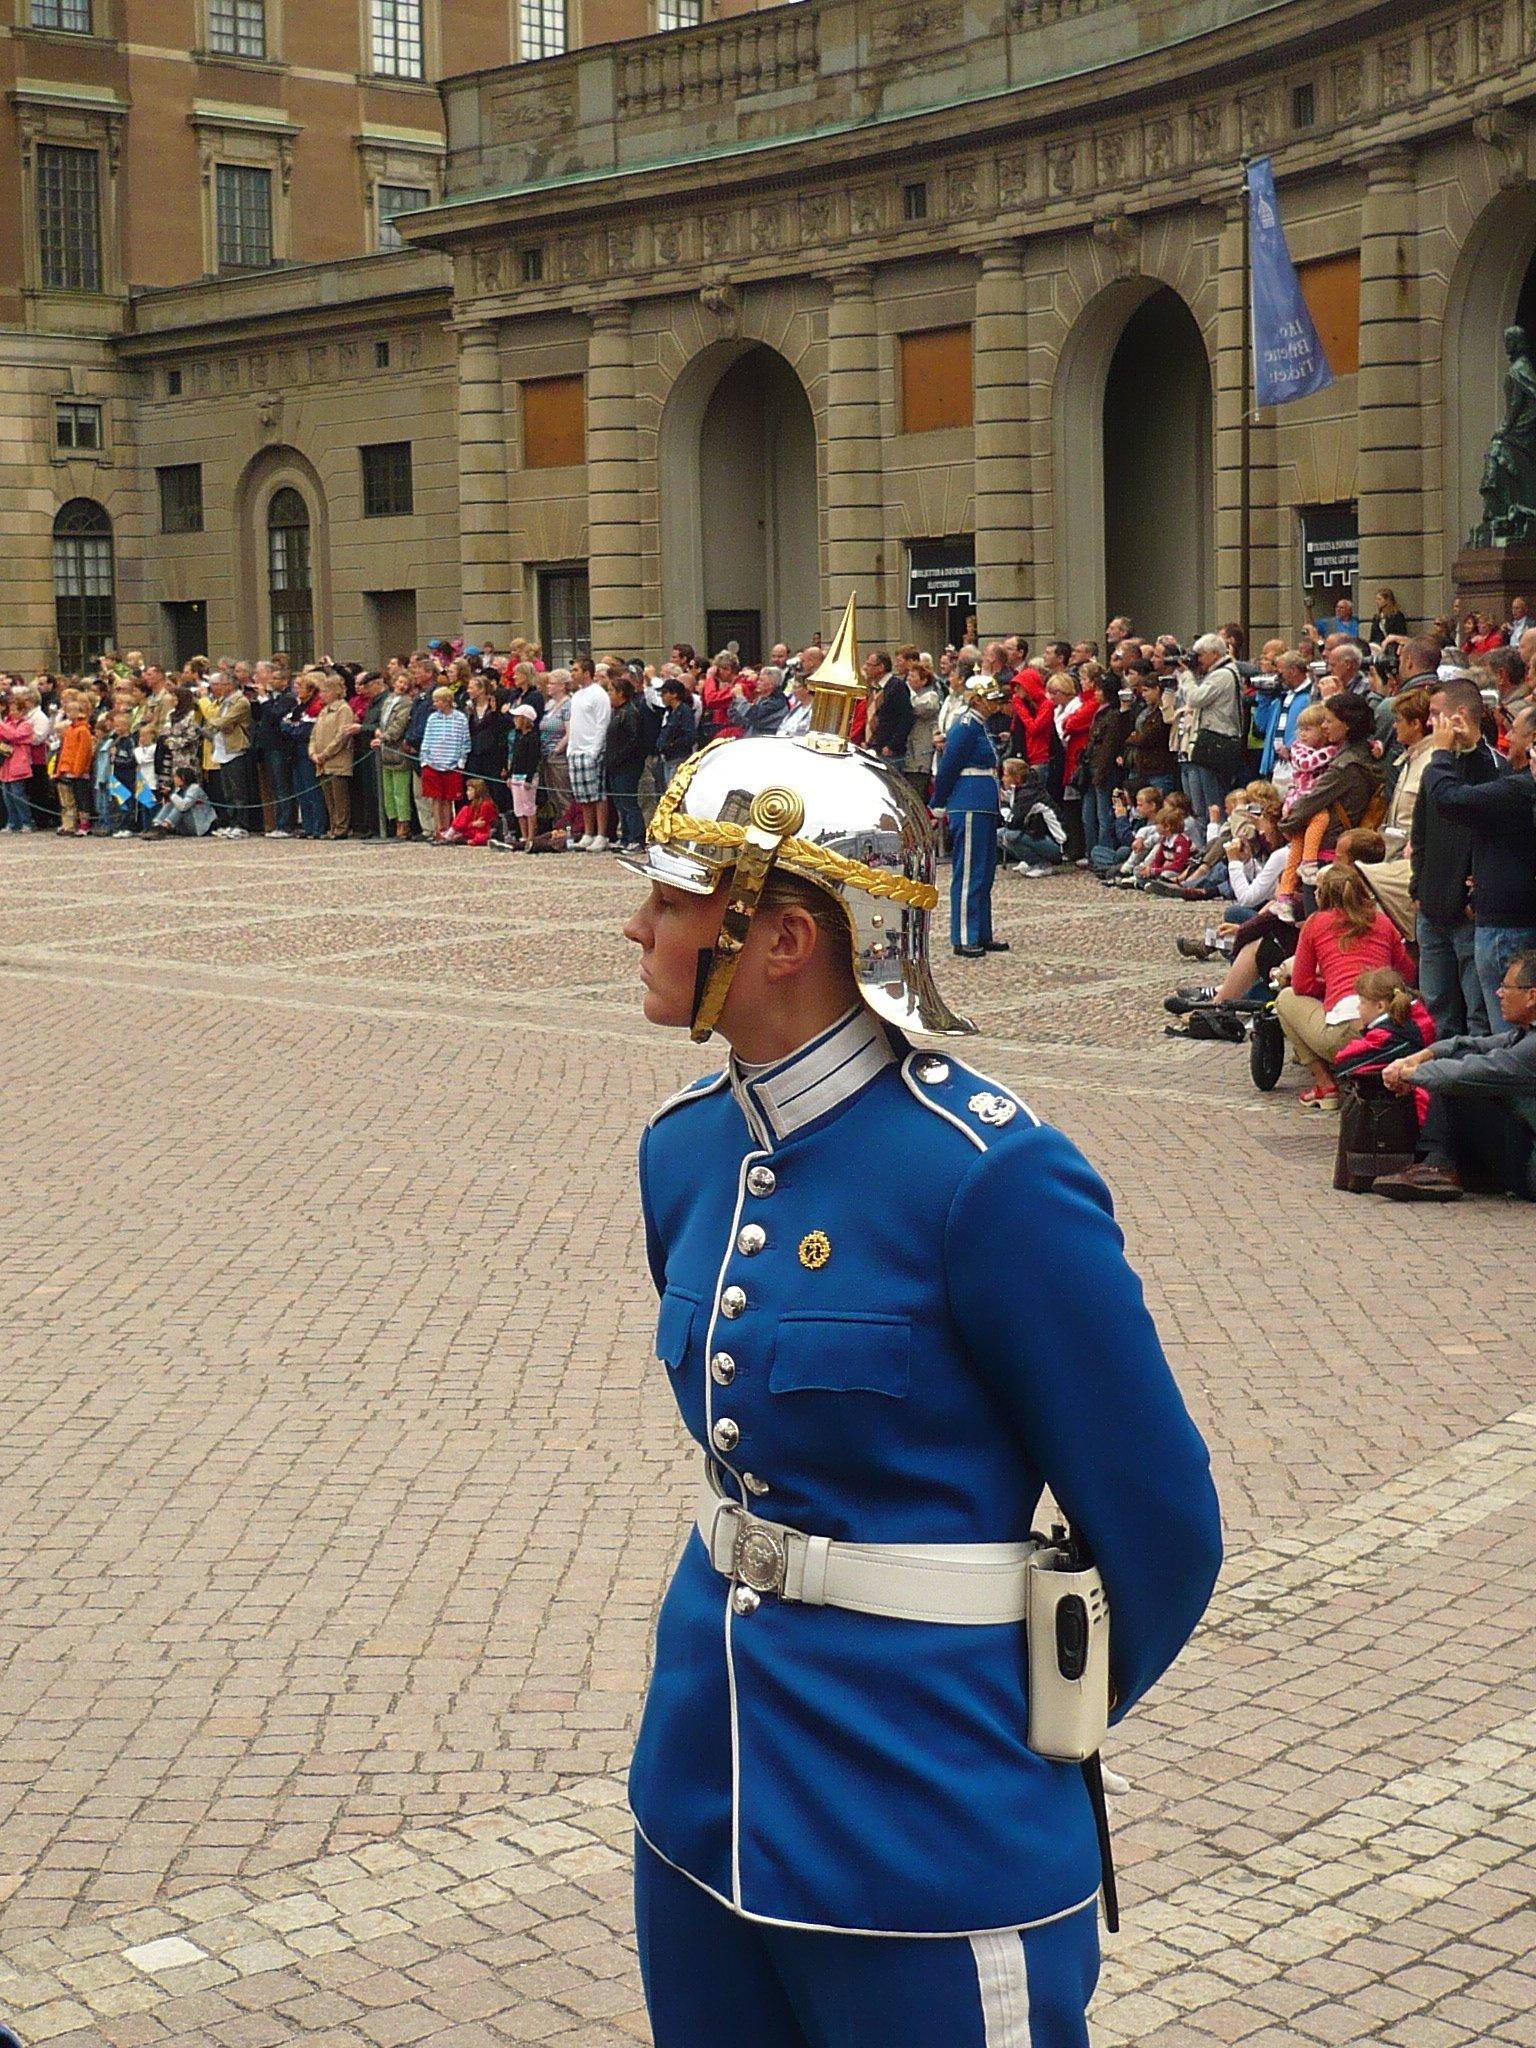 Royal Palace - Stockholm